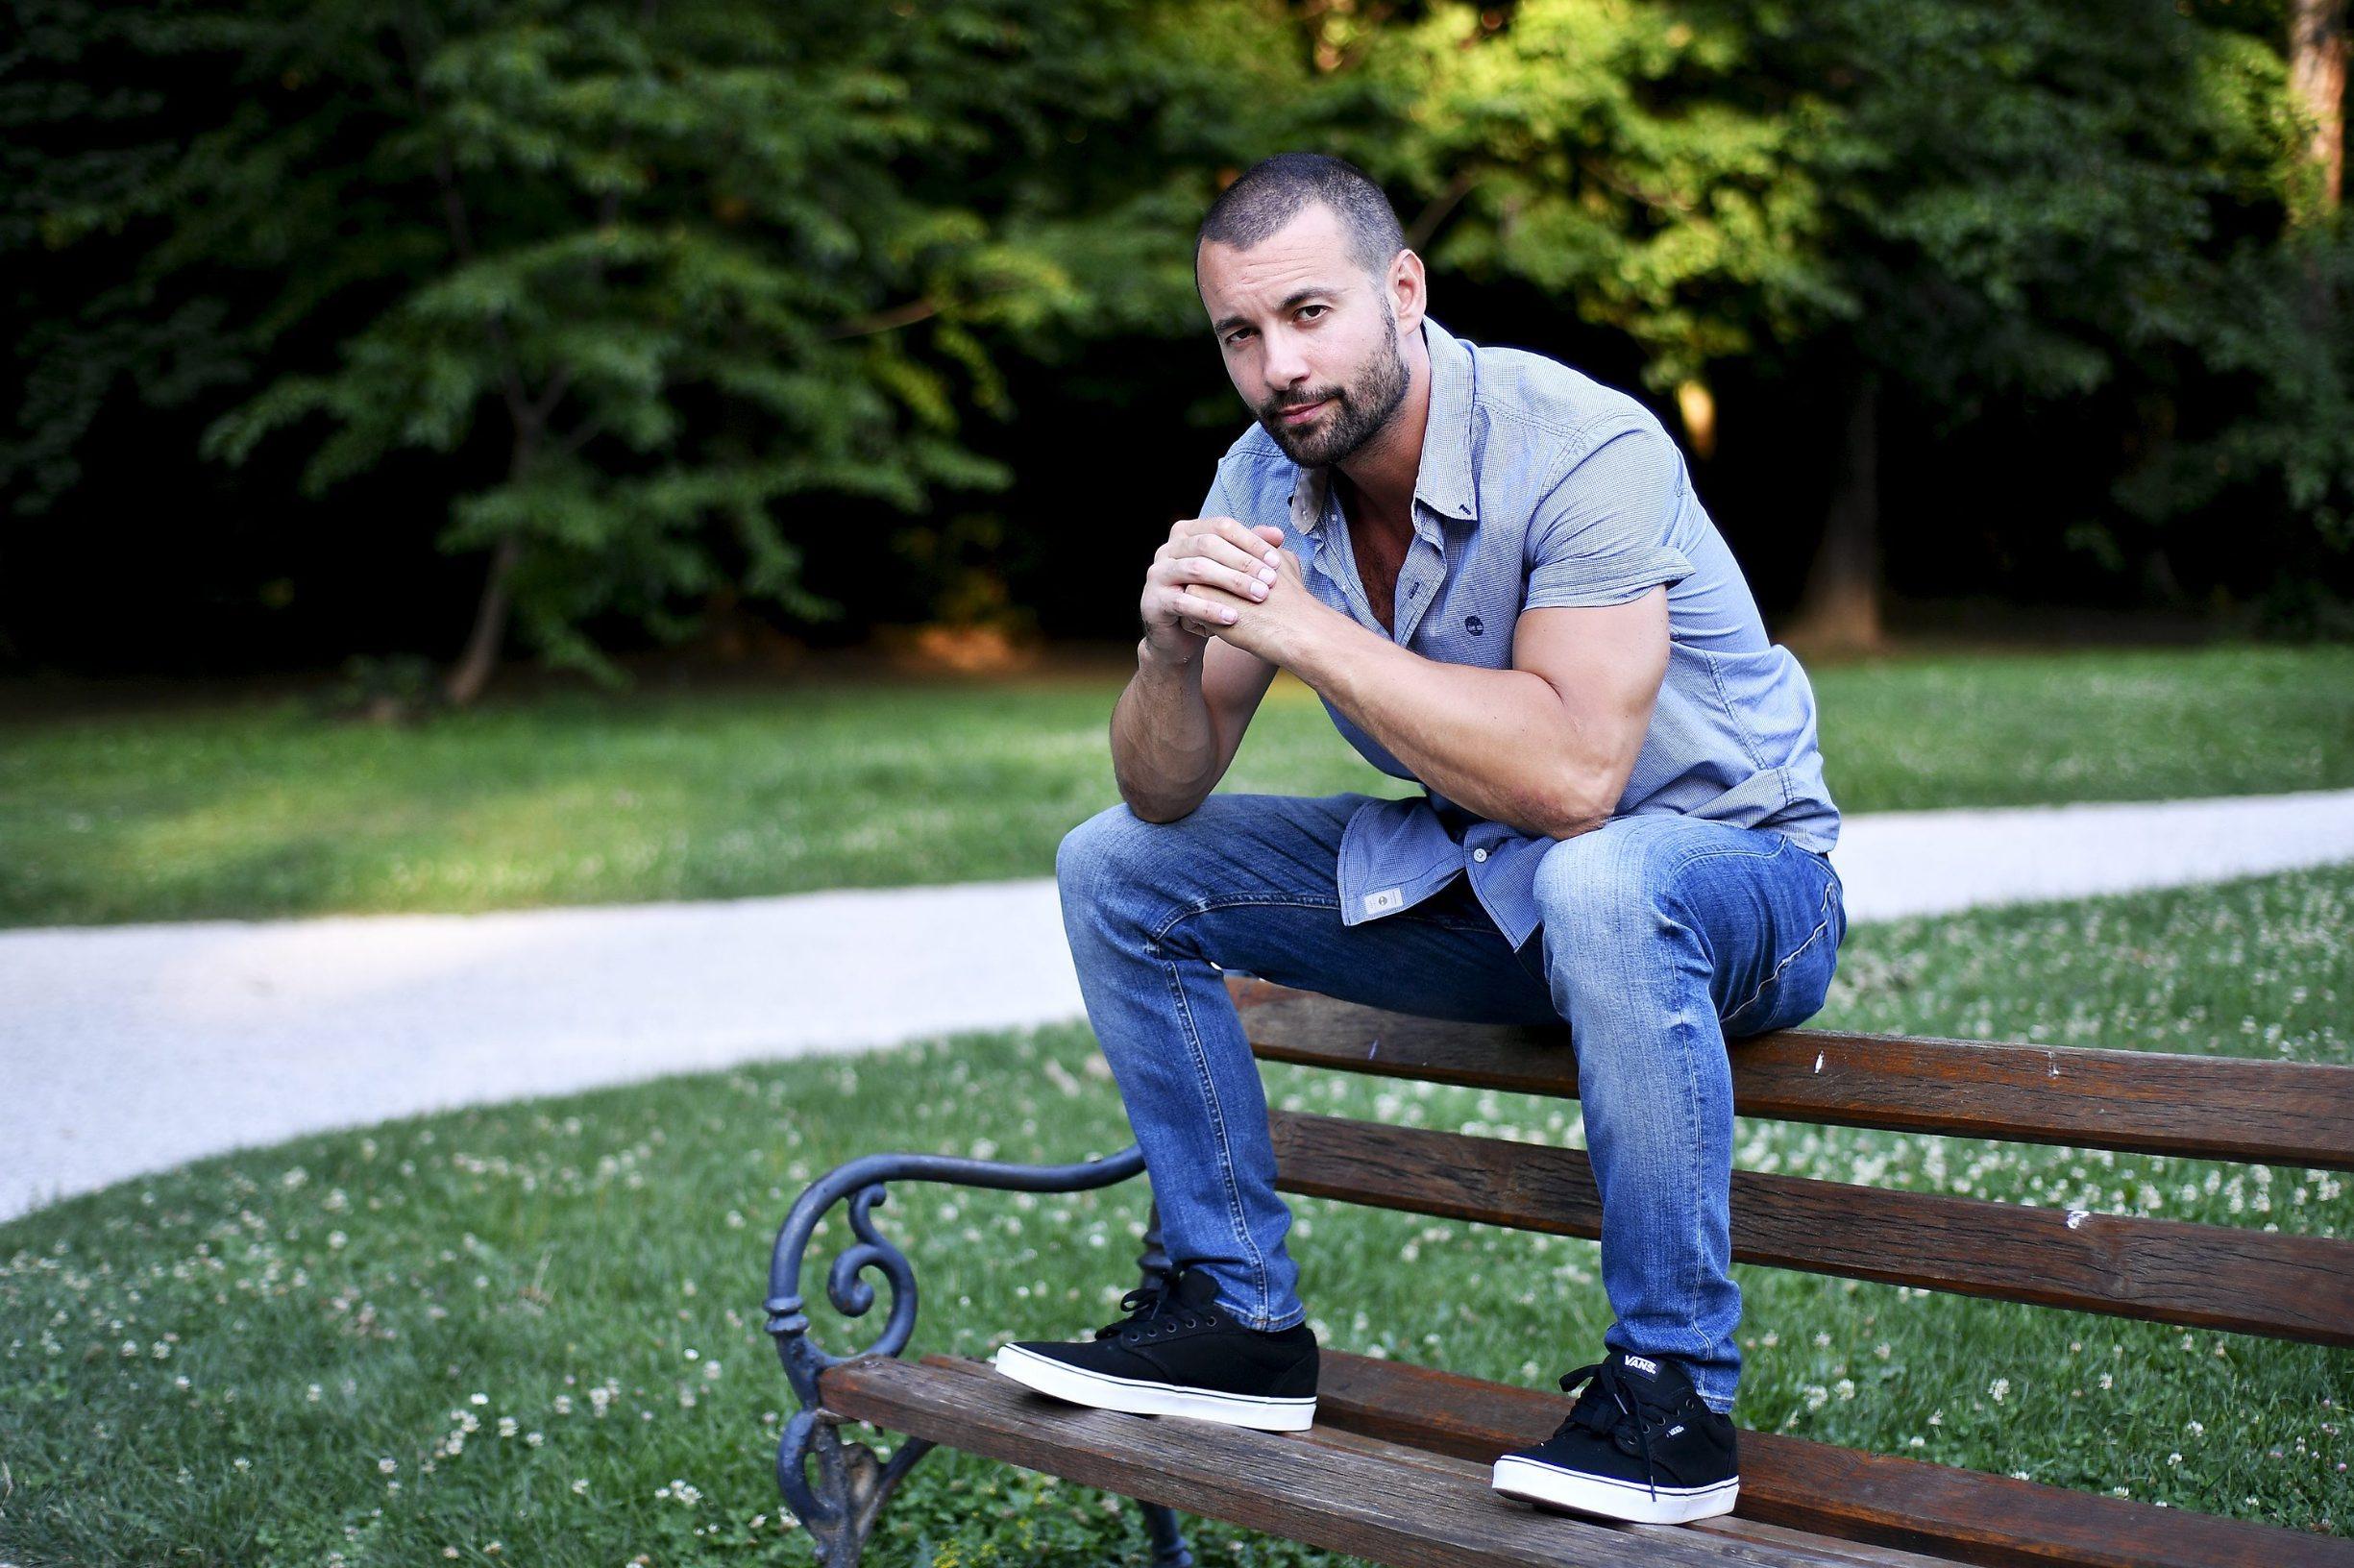 Zagreb, 080717. Glumac Ivan Herceg, fotografiran u parku Maksimir. Foto: Boris Kovacev / CROPIX